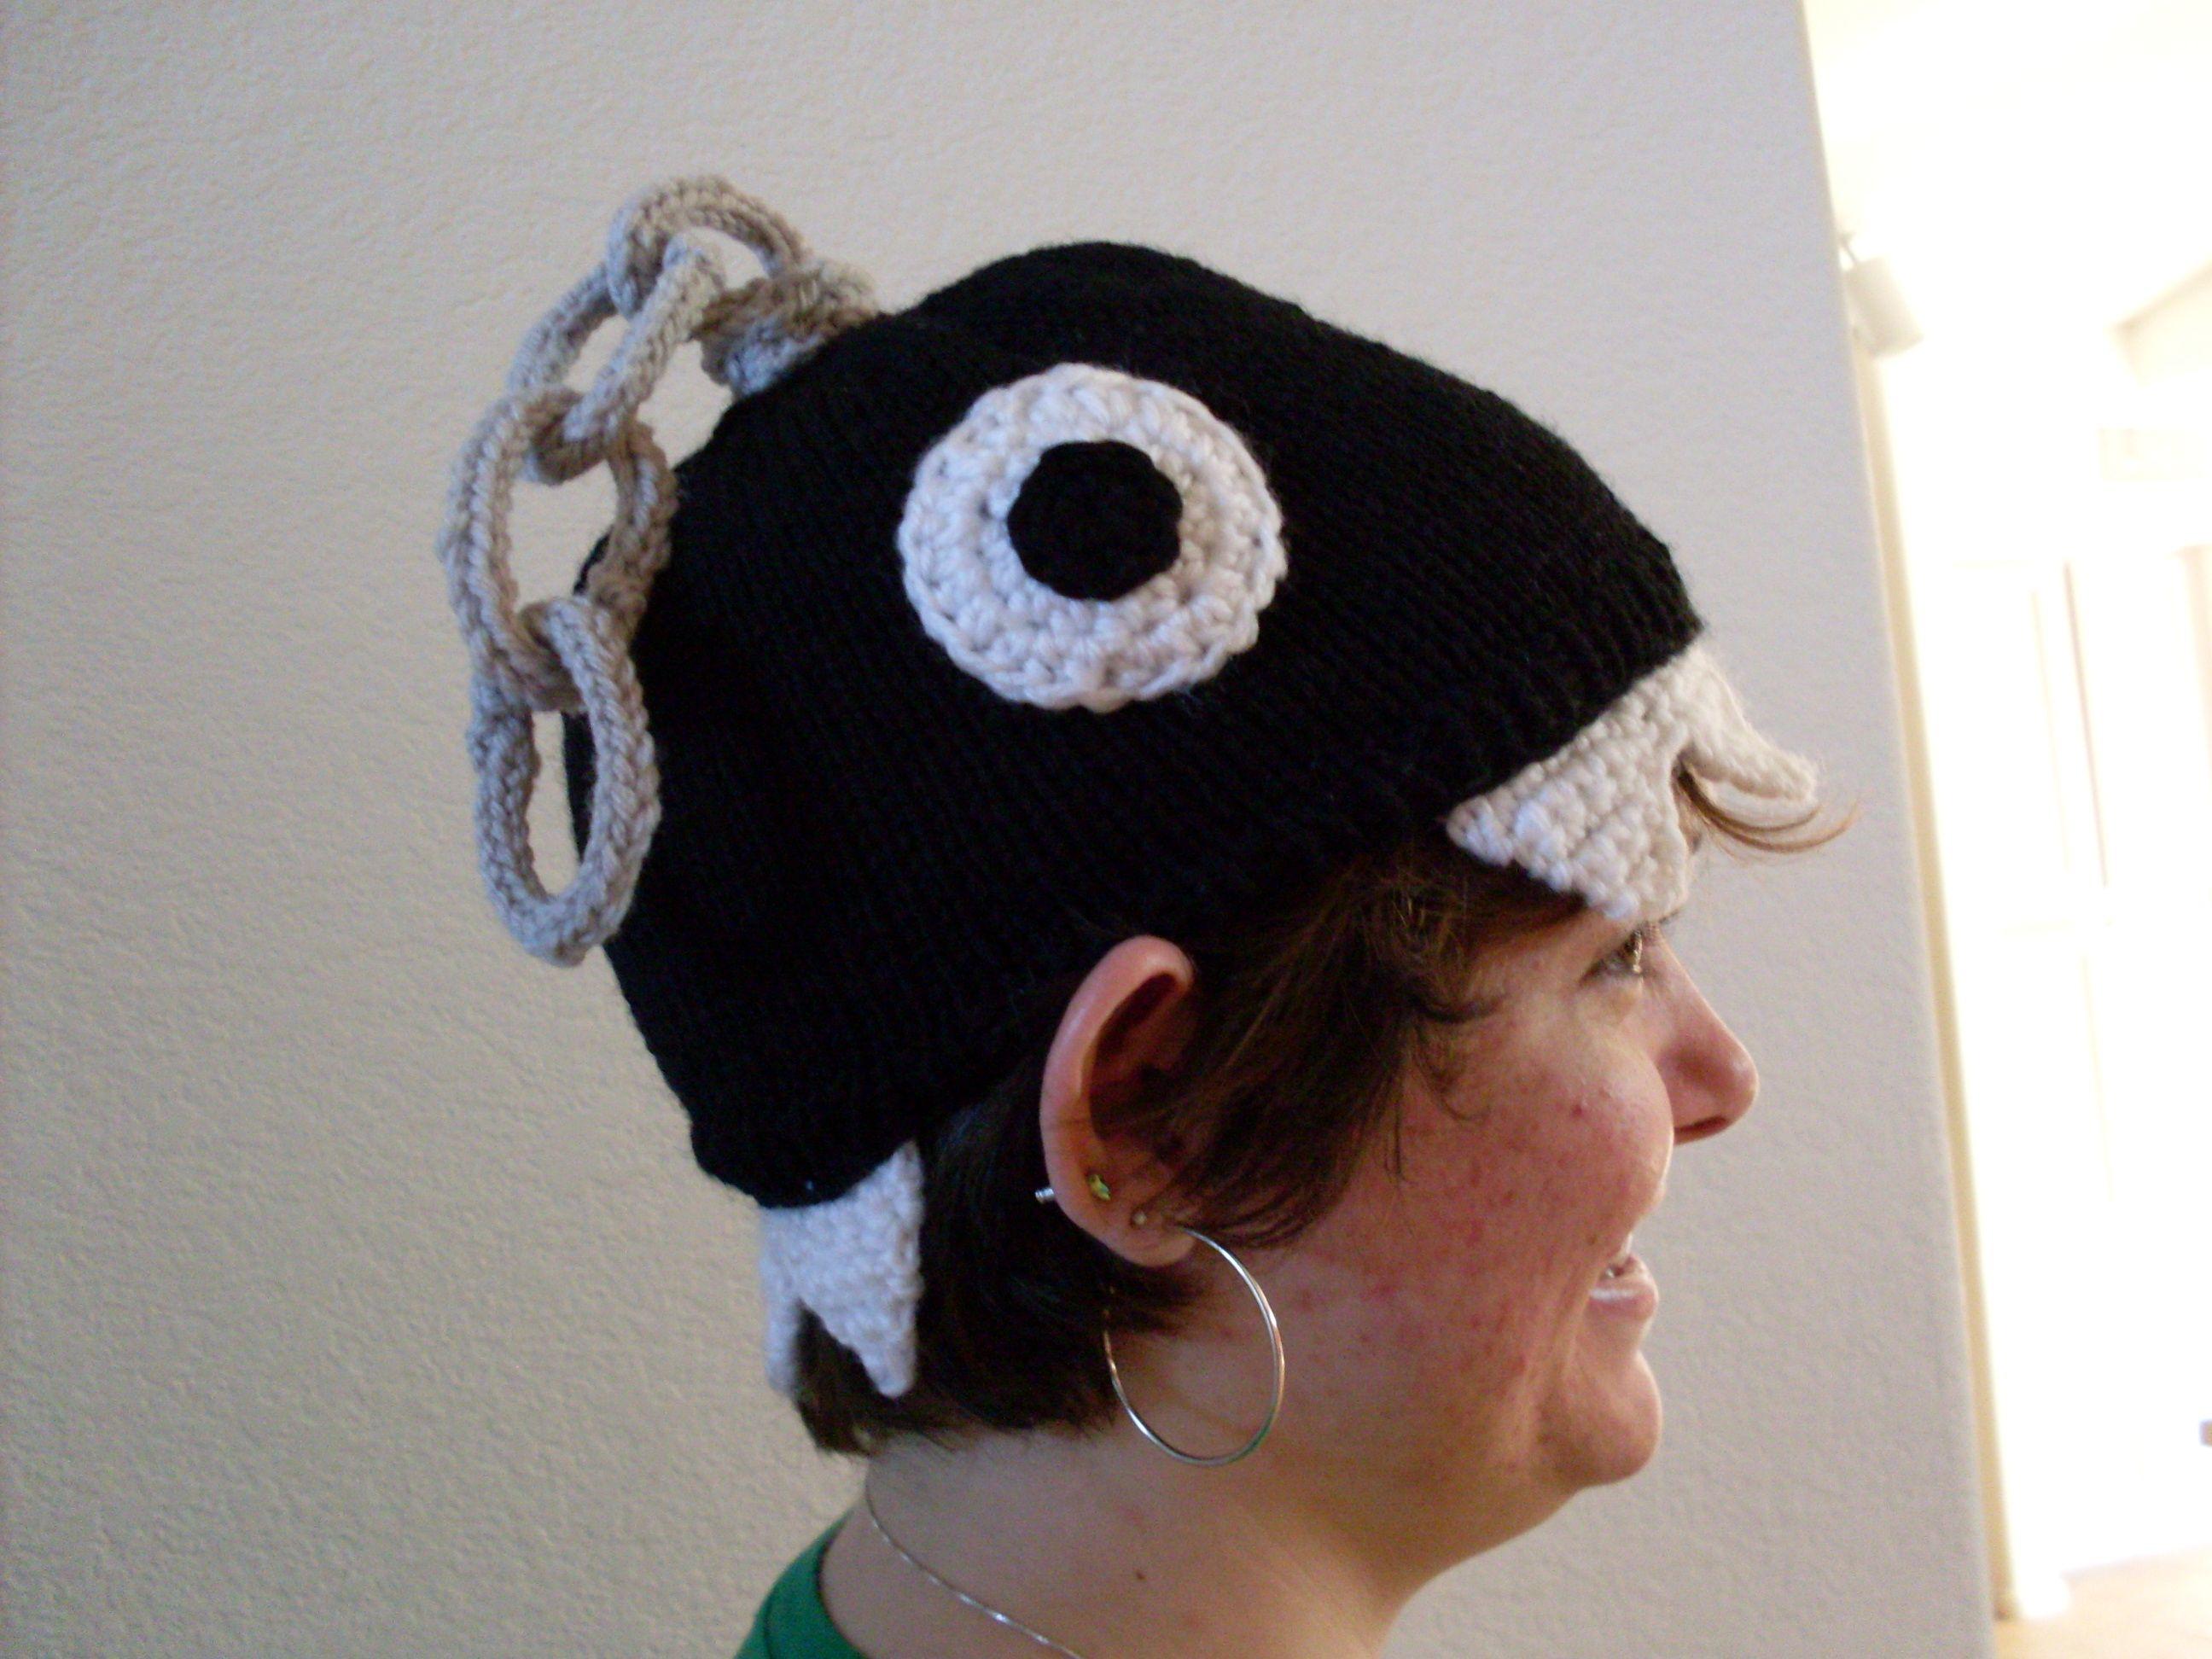 My chain chomp hat.